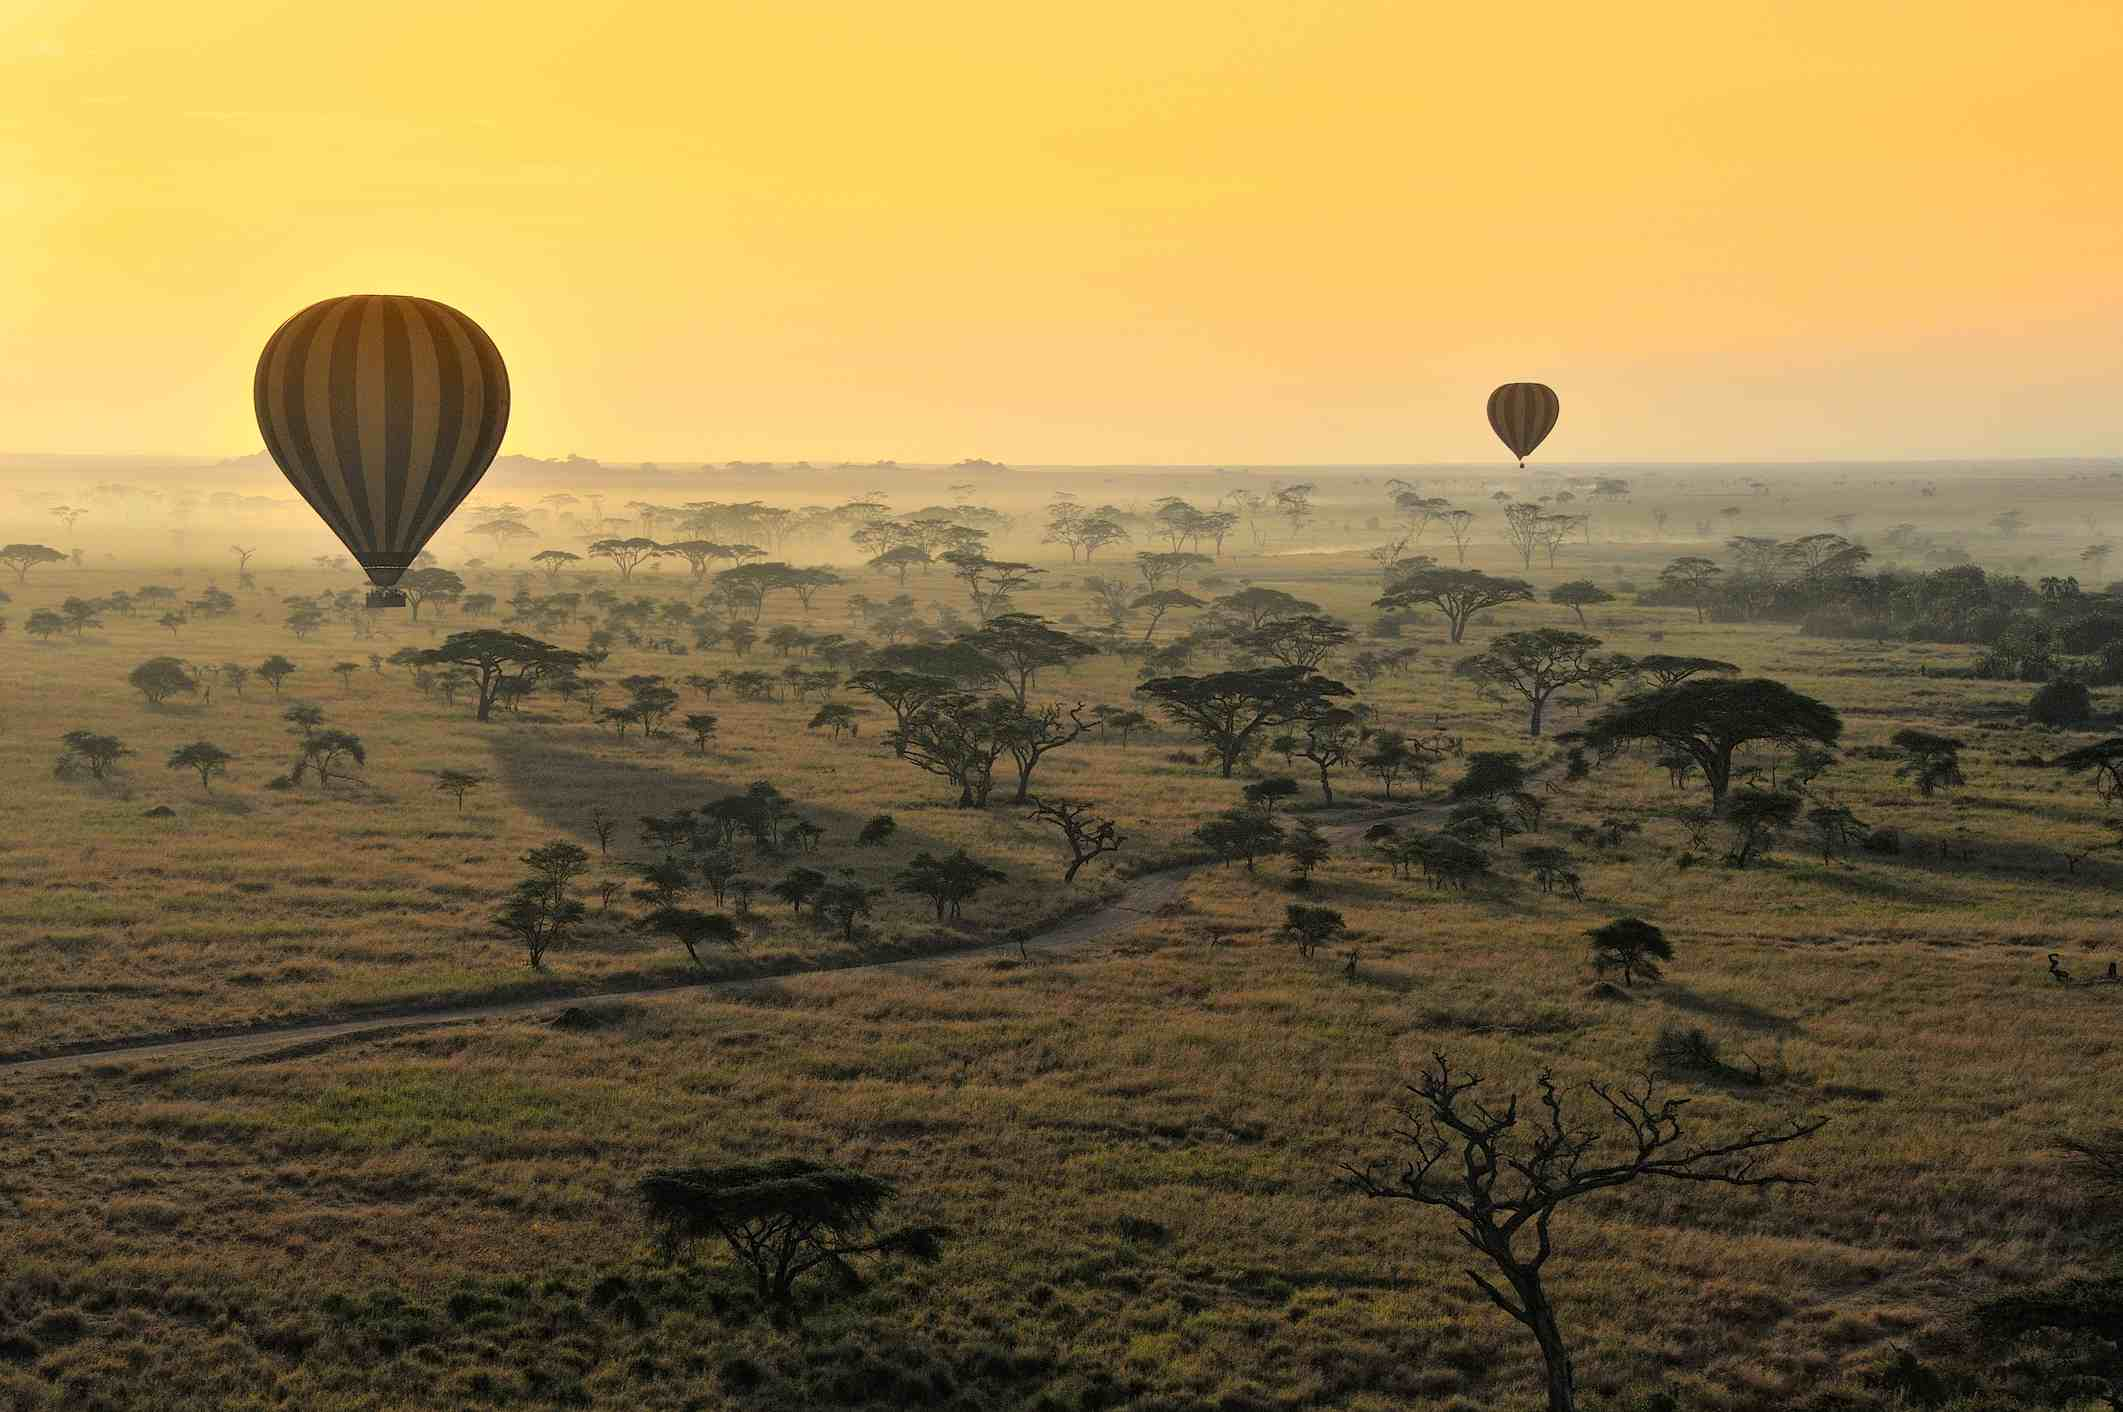 The Top Five Tanzania Safari Itineraries for 2017